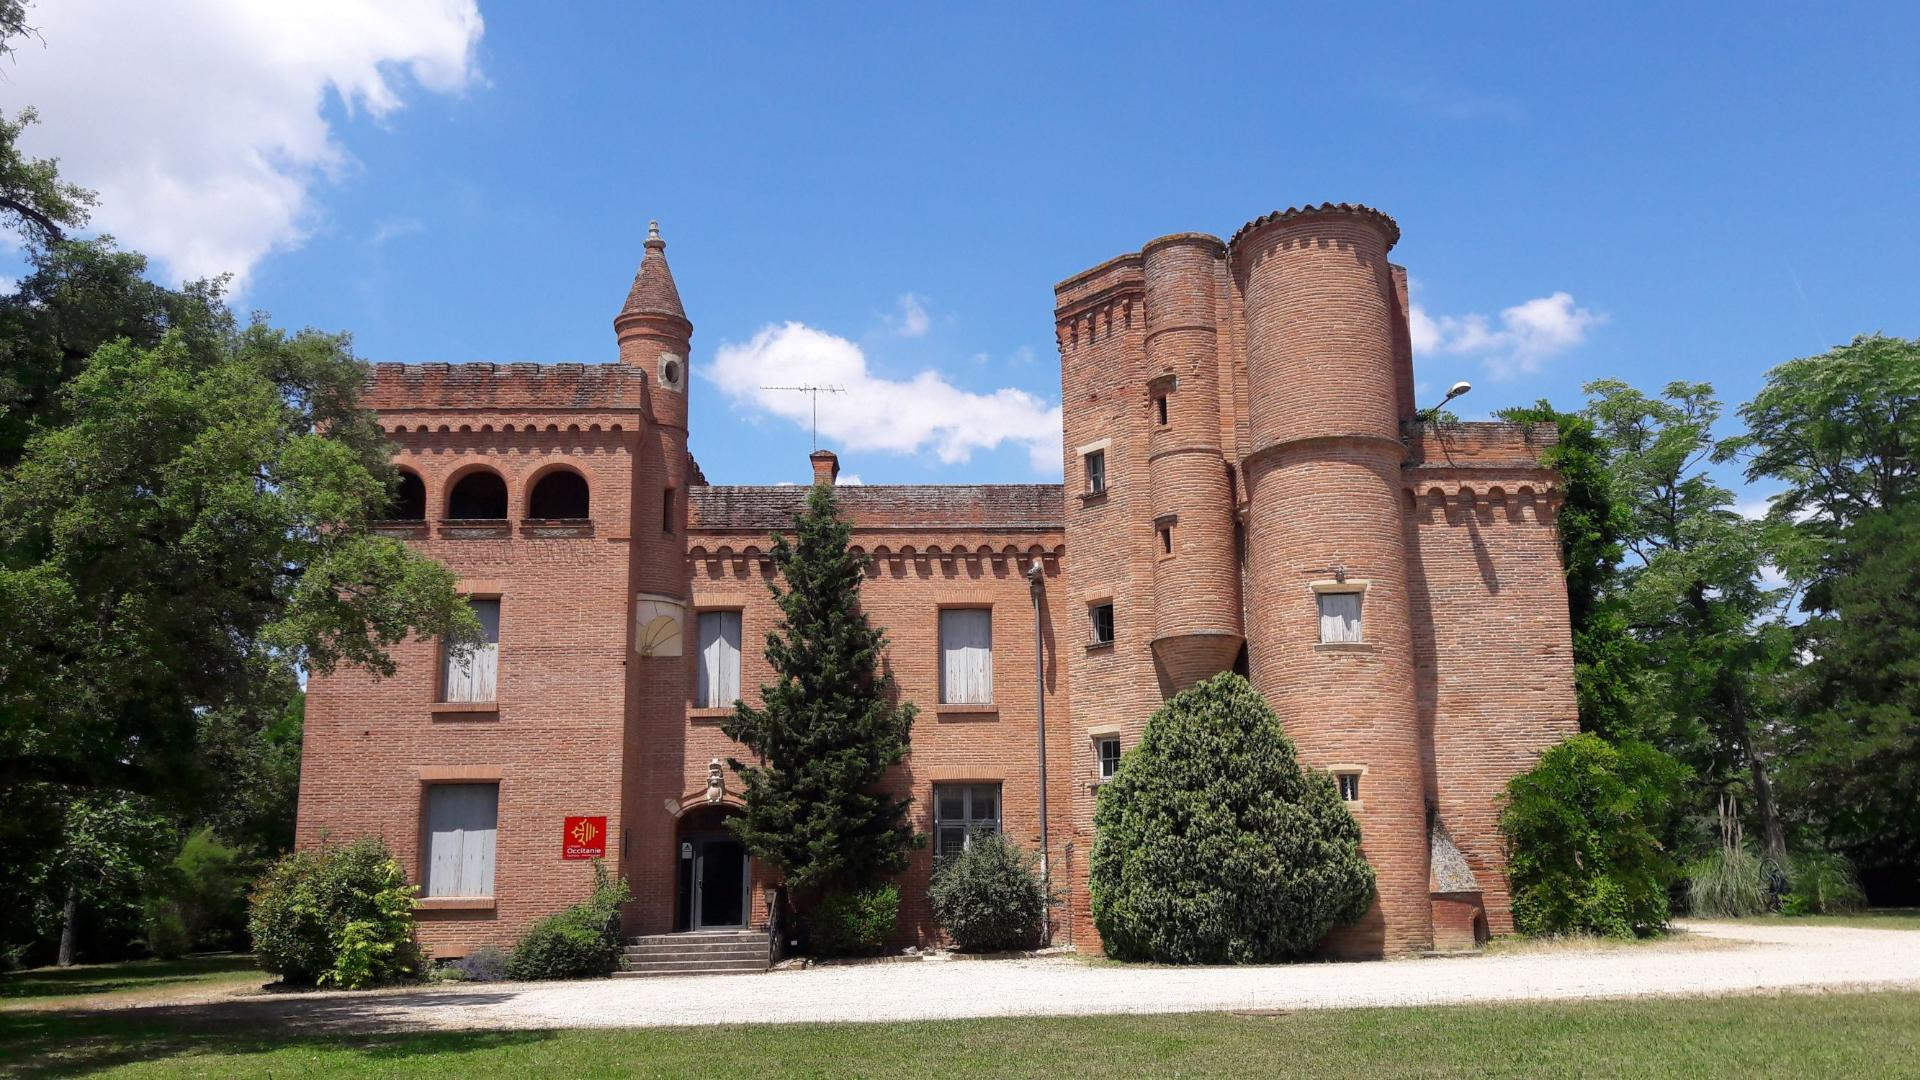 Chateau de Capou, Montauban, Tarn-et-Garonne, France